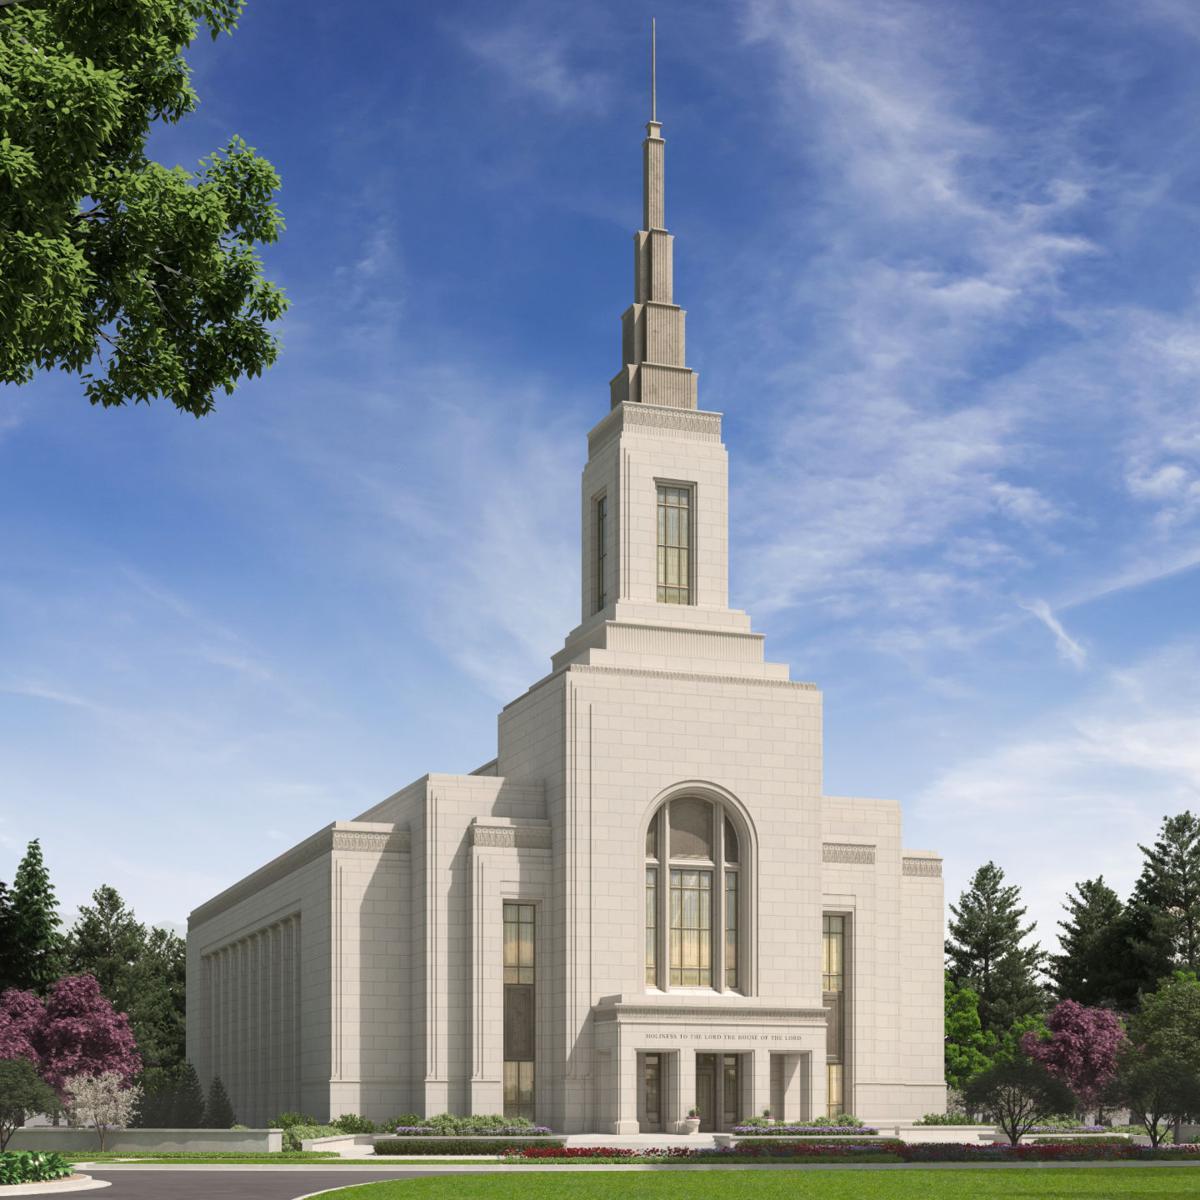 Burley LDS temple